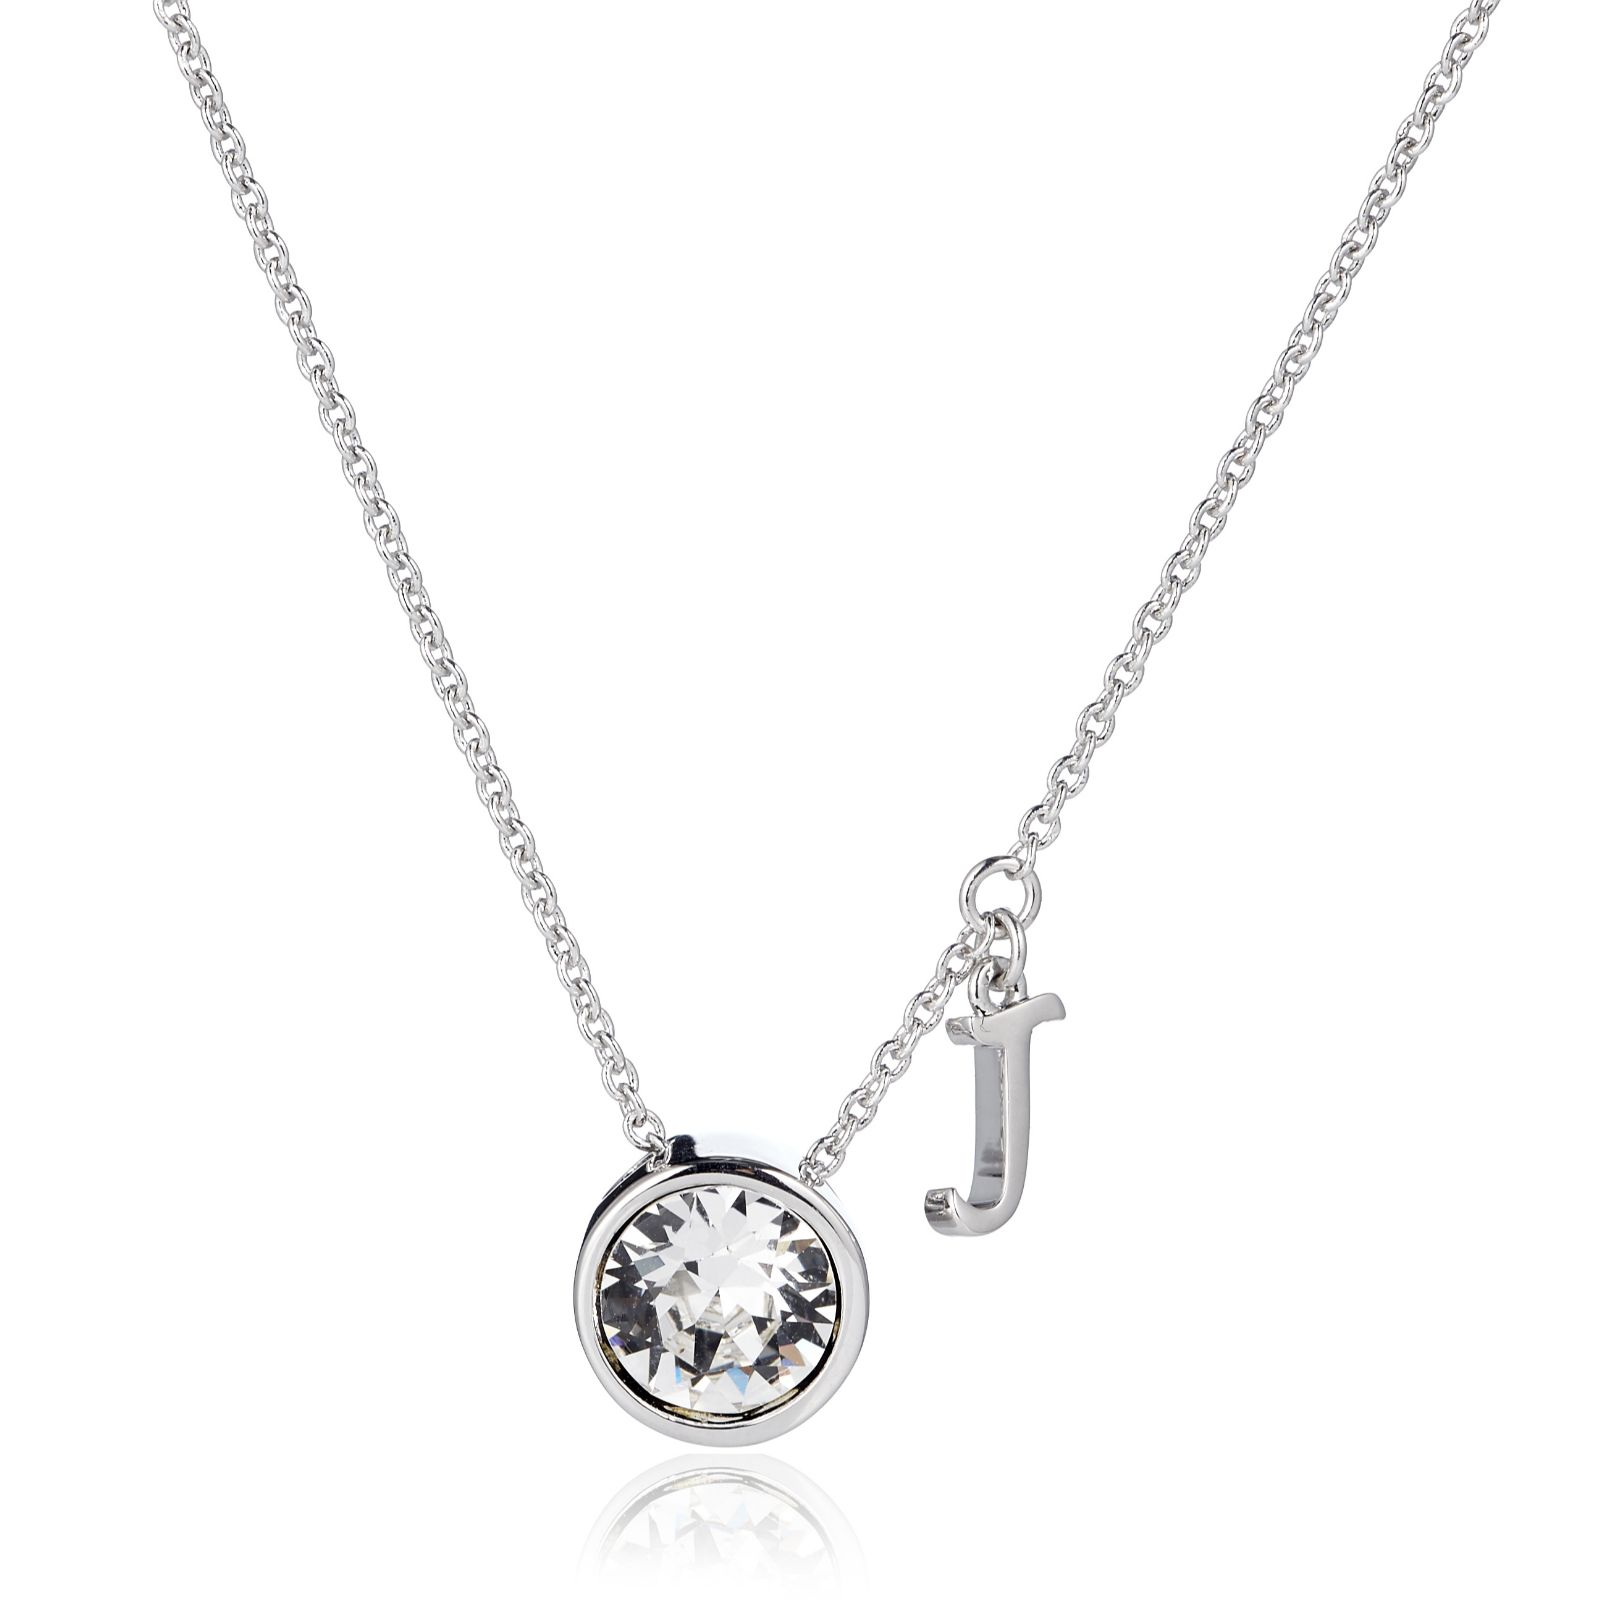 5dadad96cbe3 Outlet Aurora Swarovski Crystal Initial Charm 52cm Necklace - Page 1 - QVC  UK